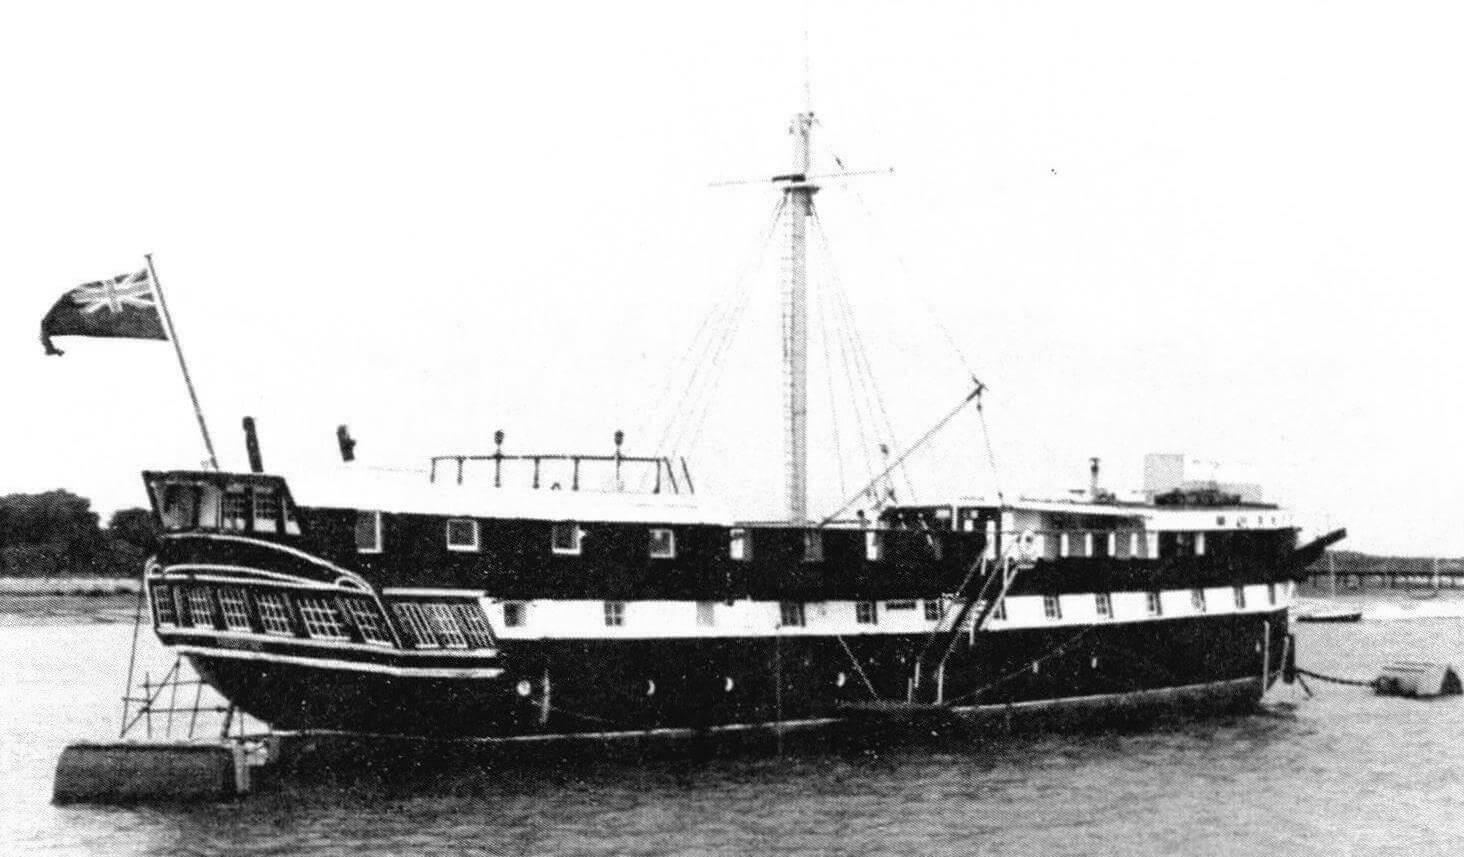 Учебное судно «Фудроянт» незадолго до начала восстановления в качестве фрегата